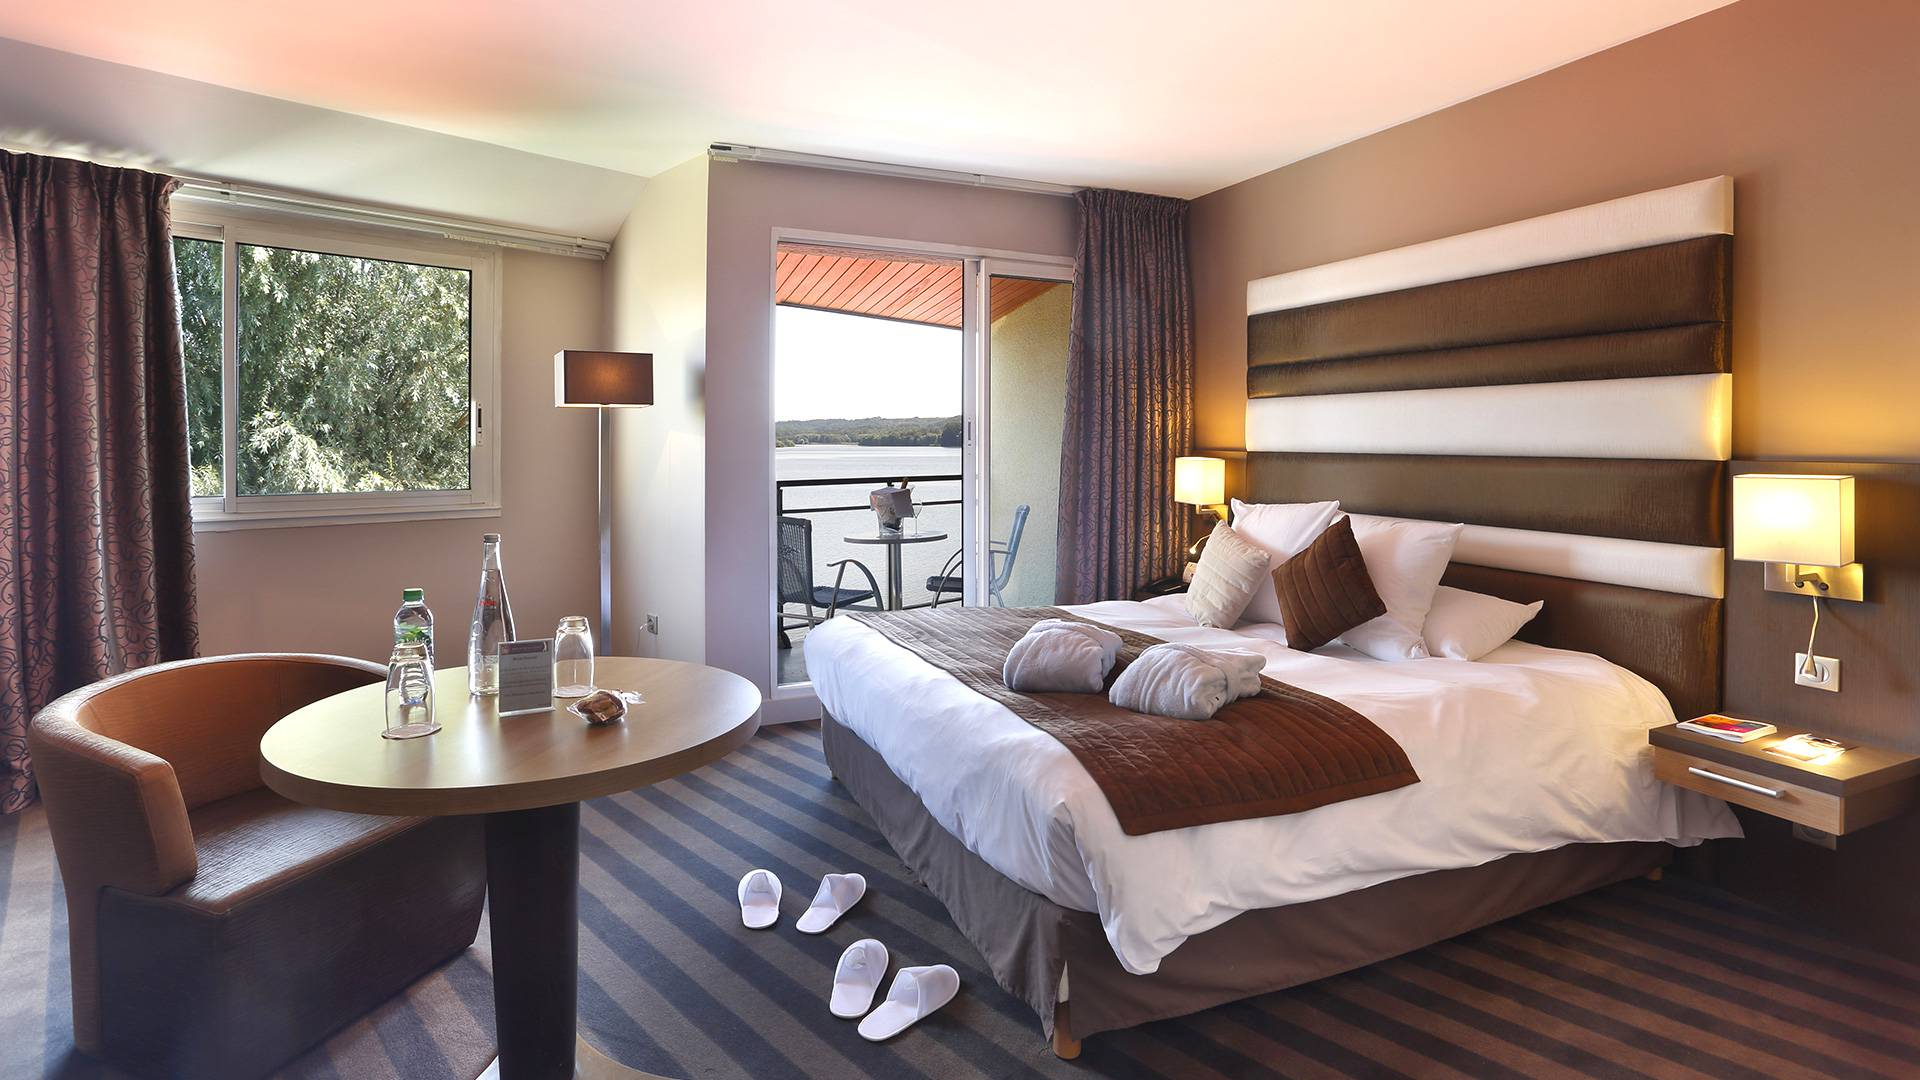 Chambre D Hotel Avec Baignoire Balnéo